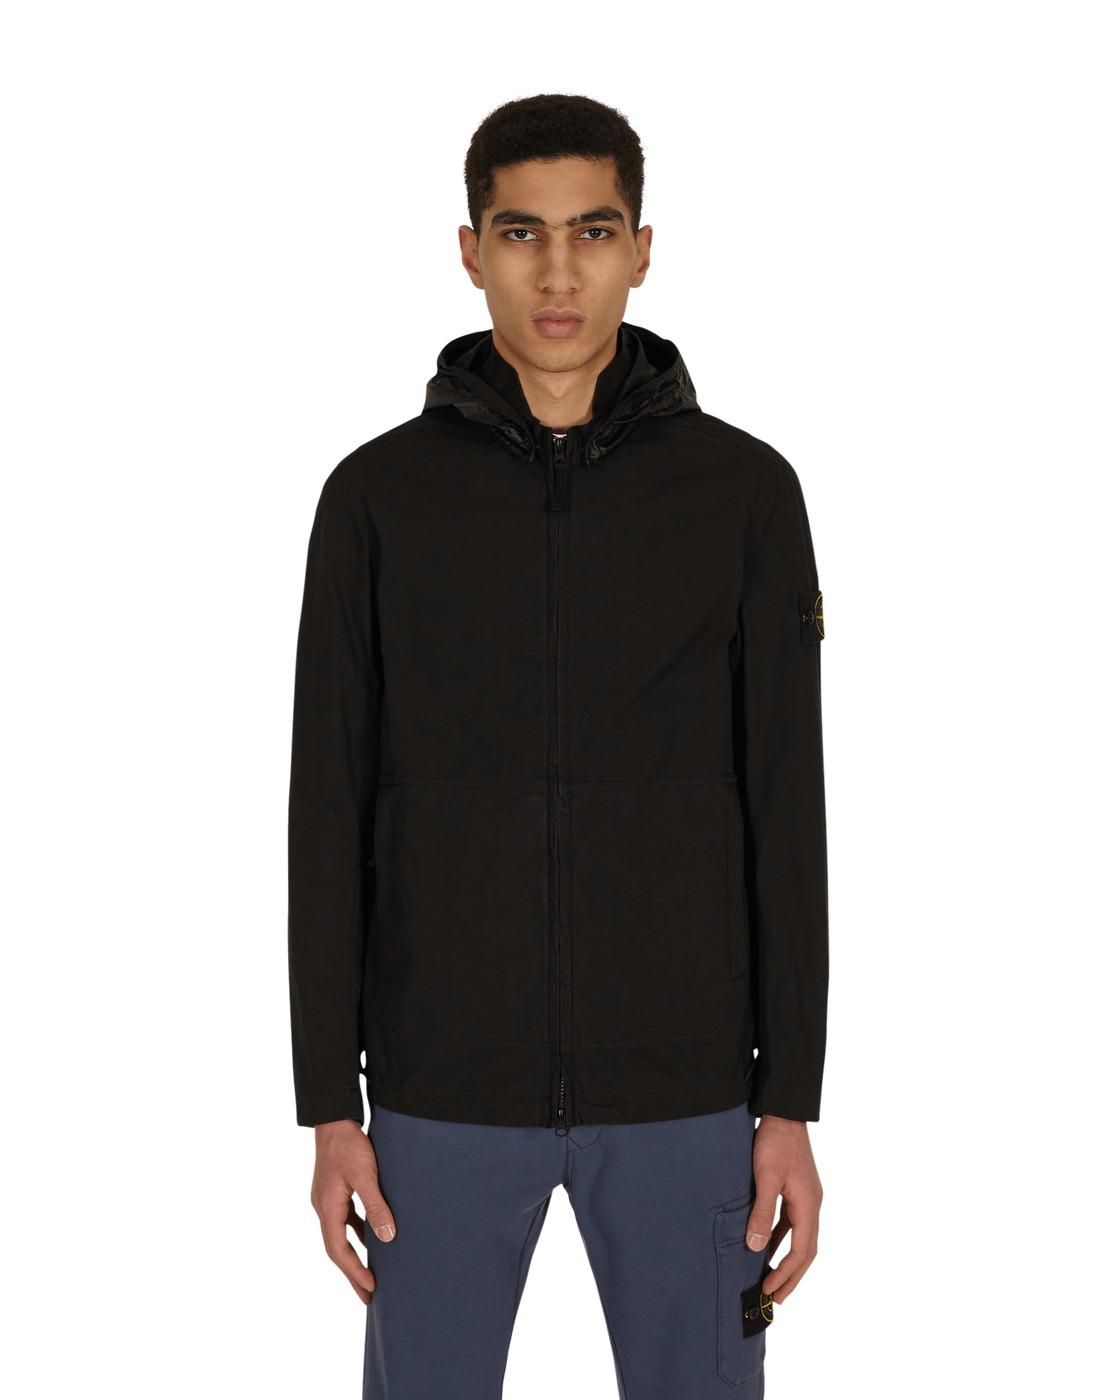 Stone Island Cotton / Cordura® Jacket Black